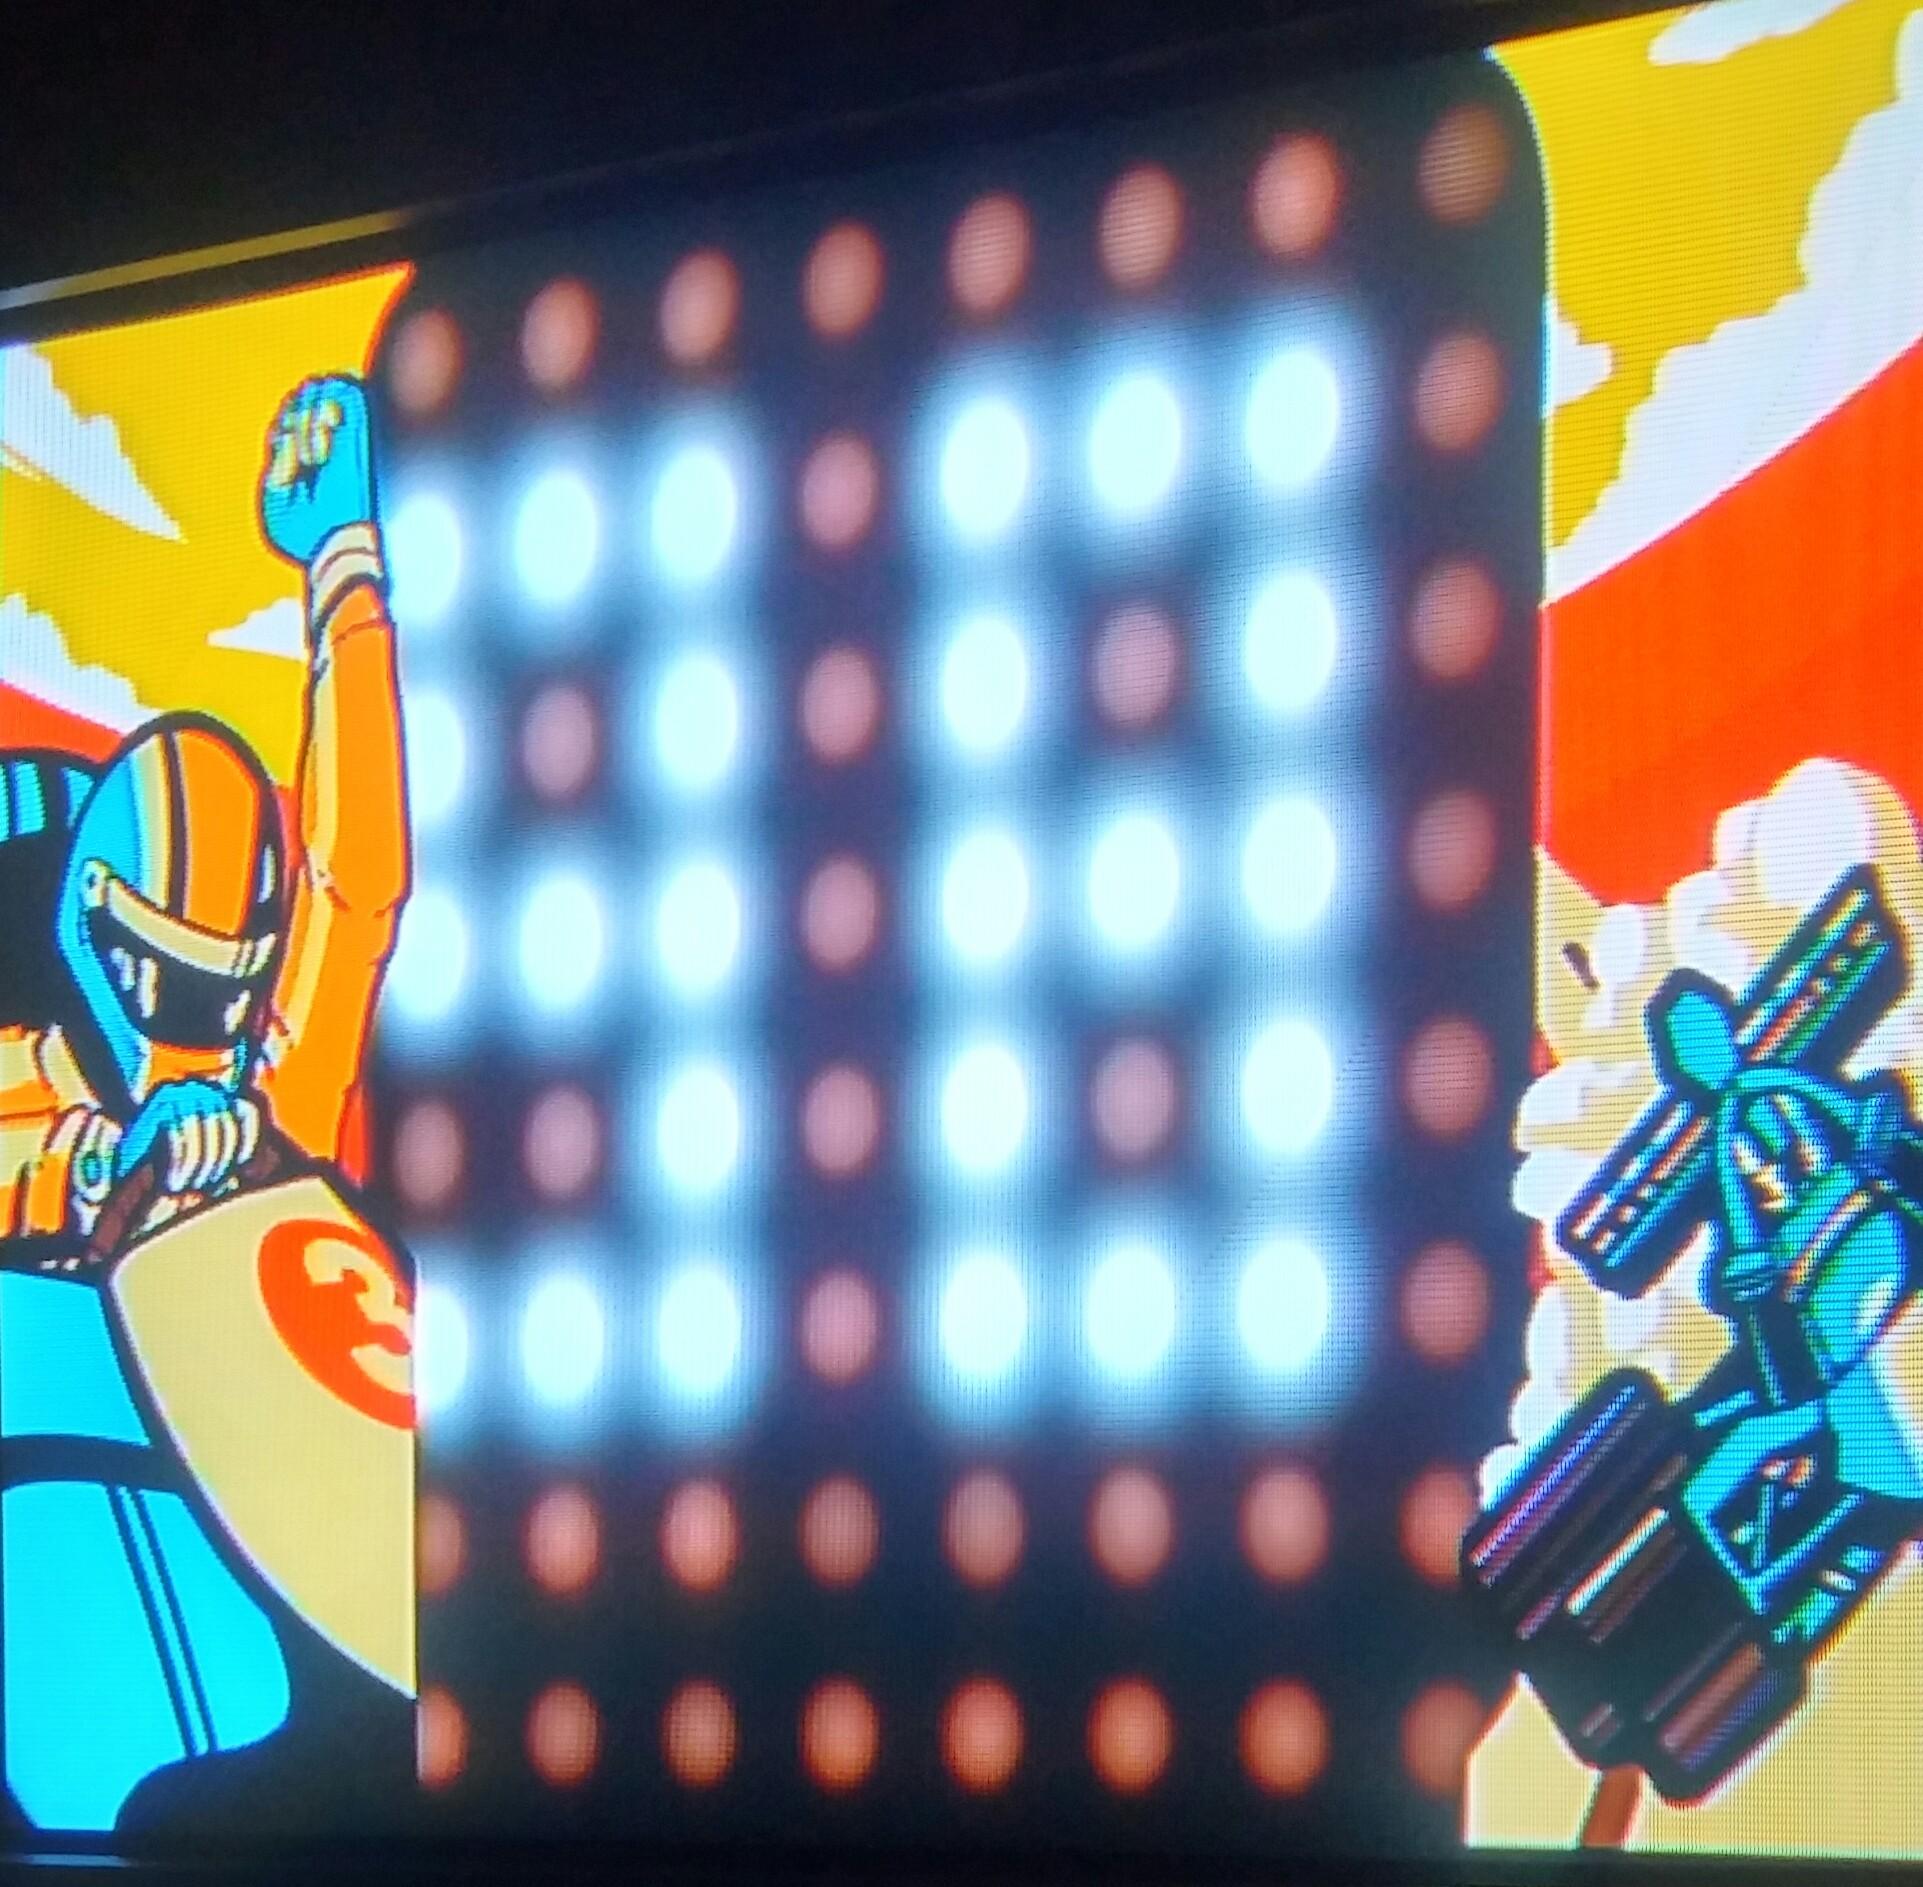 Fatlinerdadd: Dot Arcade: Rally Driver (Wii U) 98 points on 2015-05-09 20:57:56